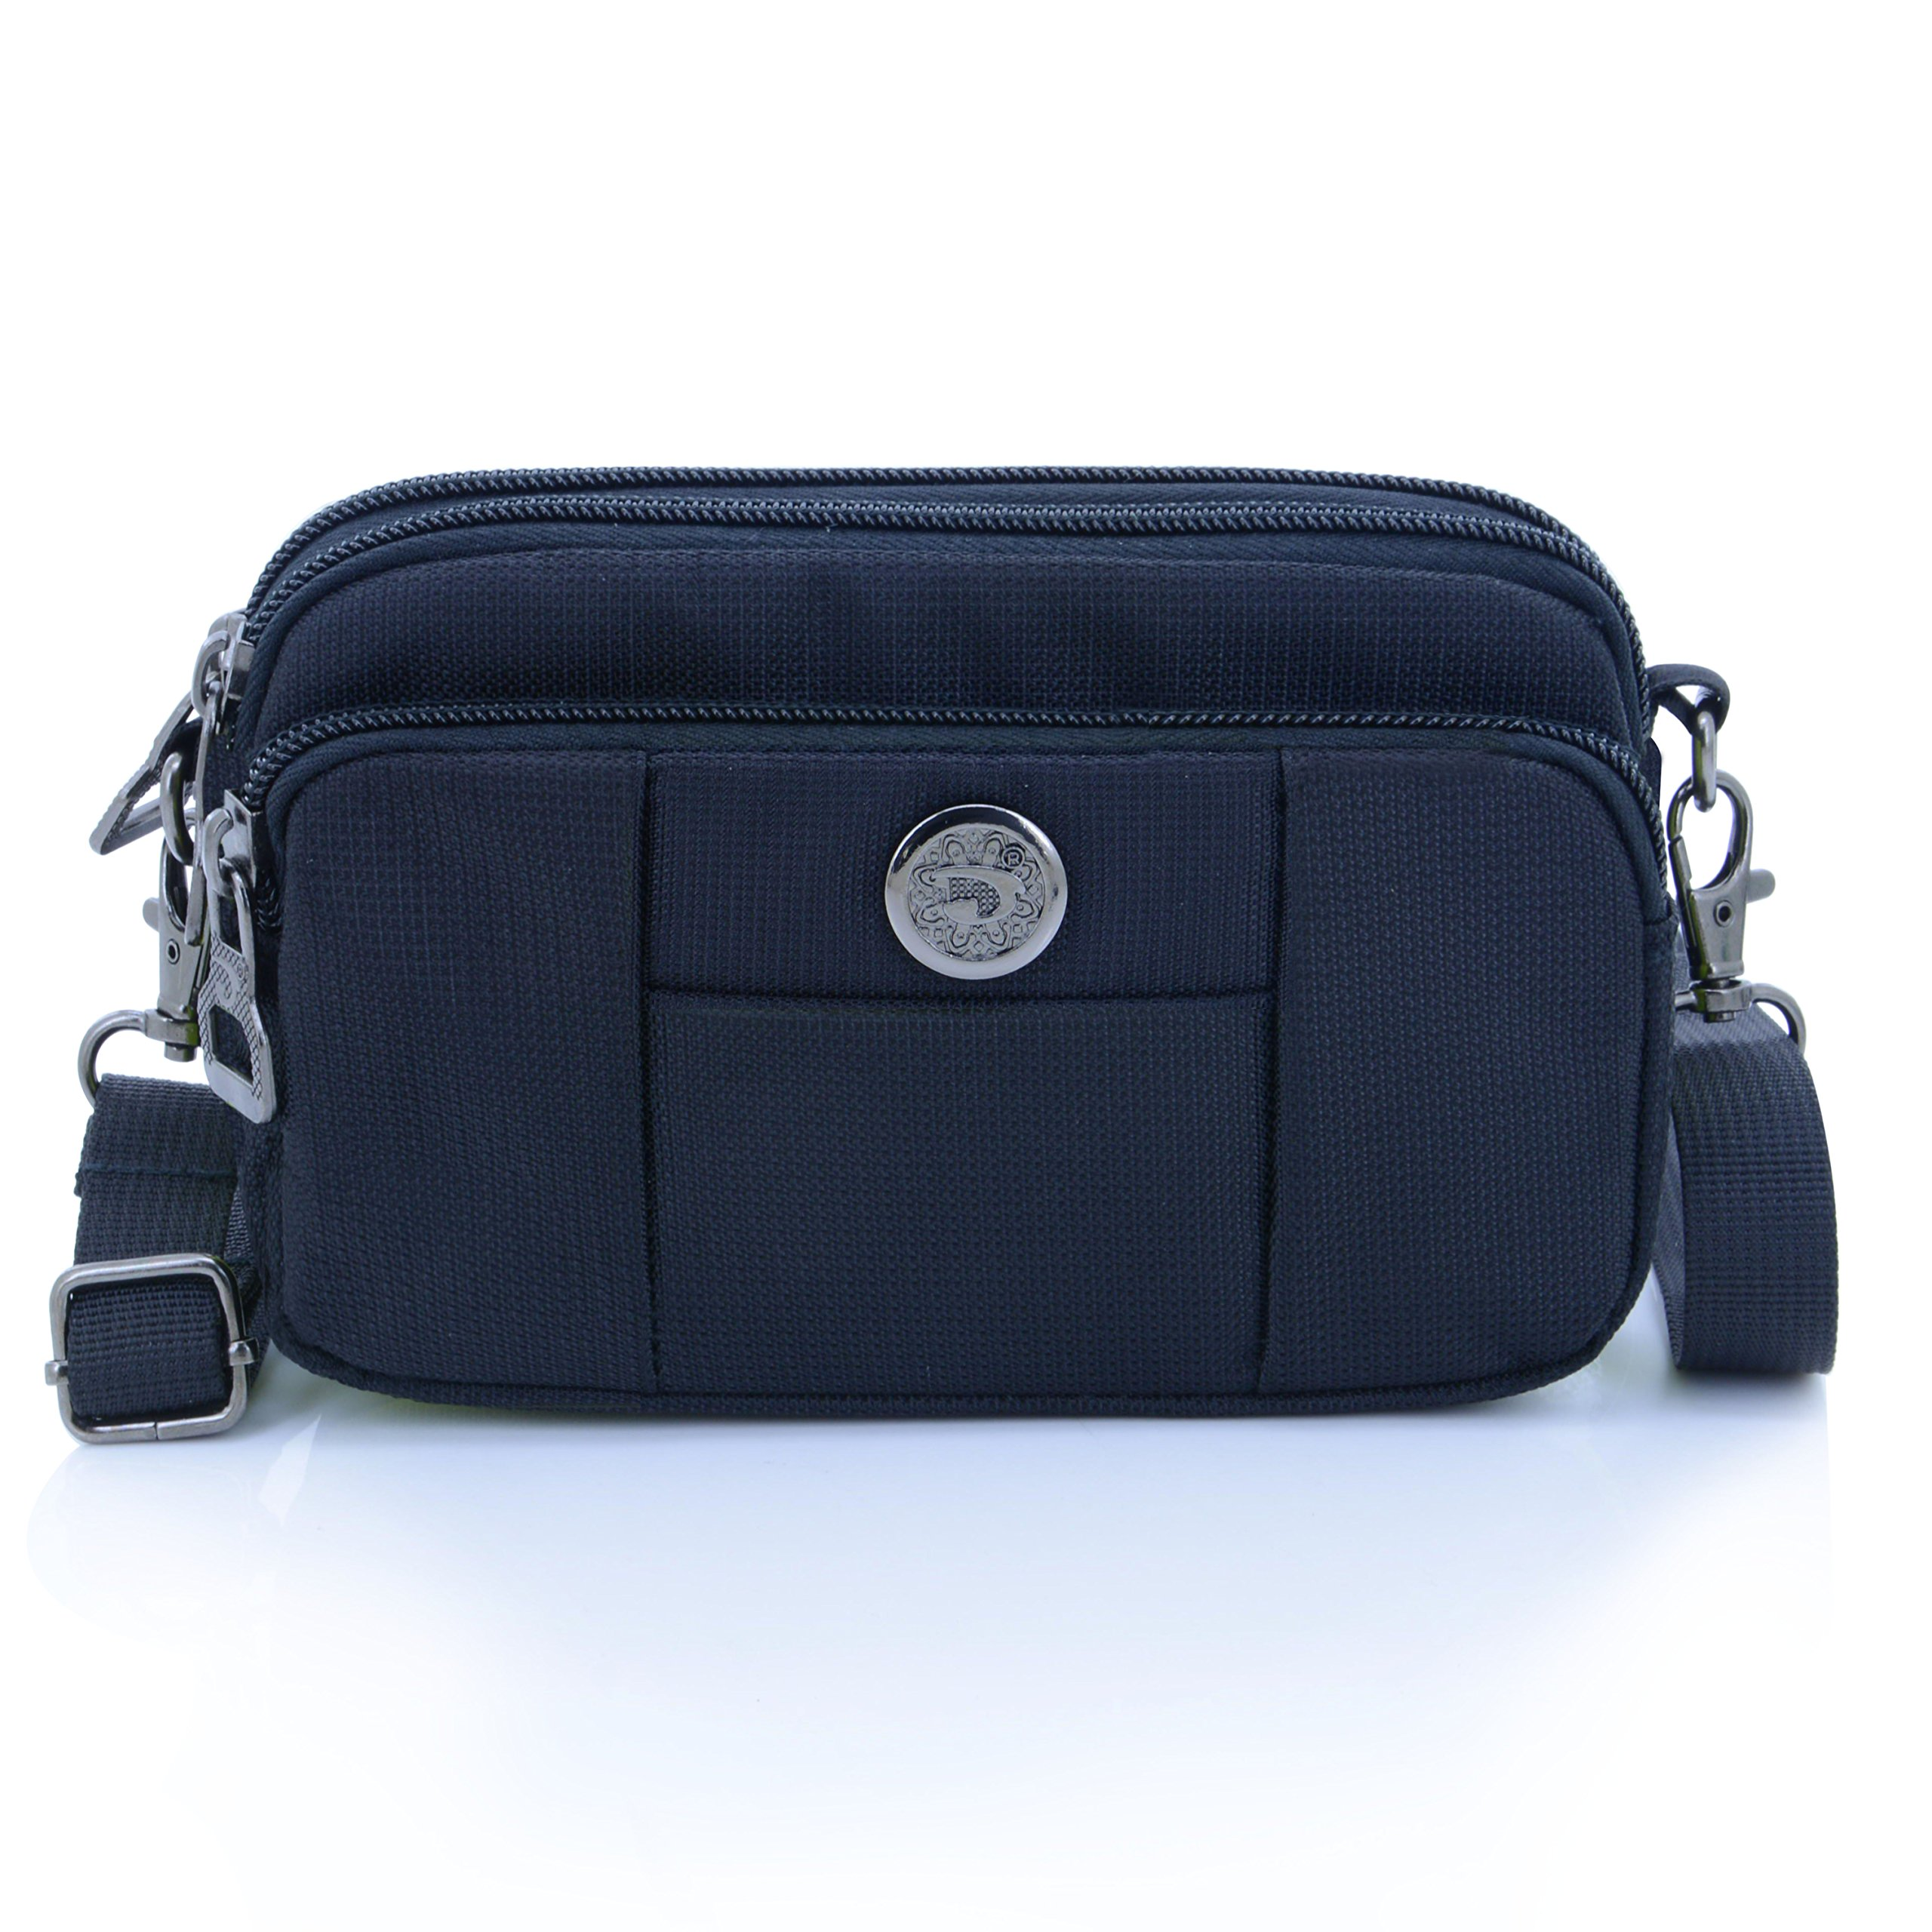 liangdongshop Essential Phone Belt Clip Waist Hip Pack Travel Messager Purse Crossbody Bag 3 Way Universal Water Resistant(Horizontal-Black)